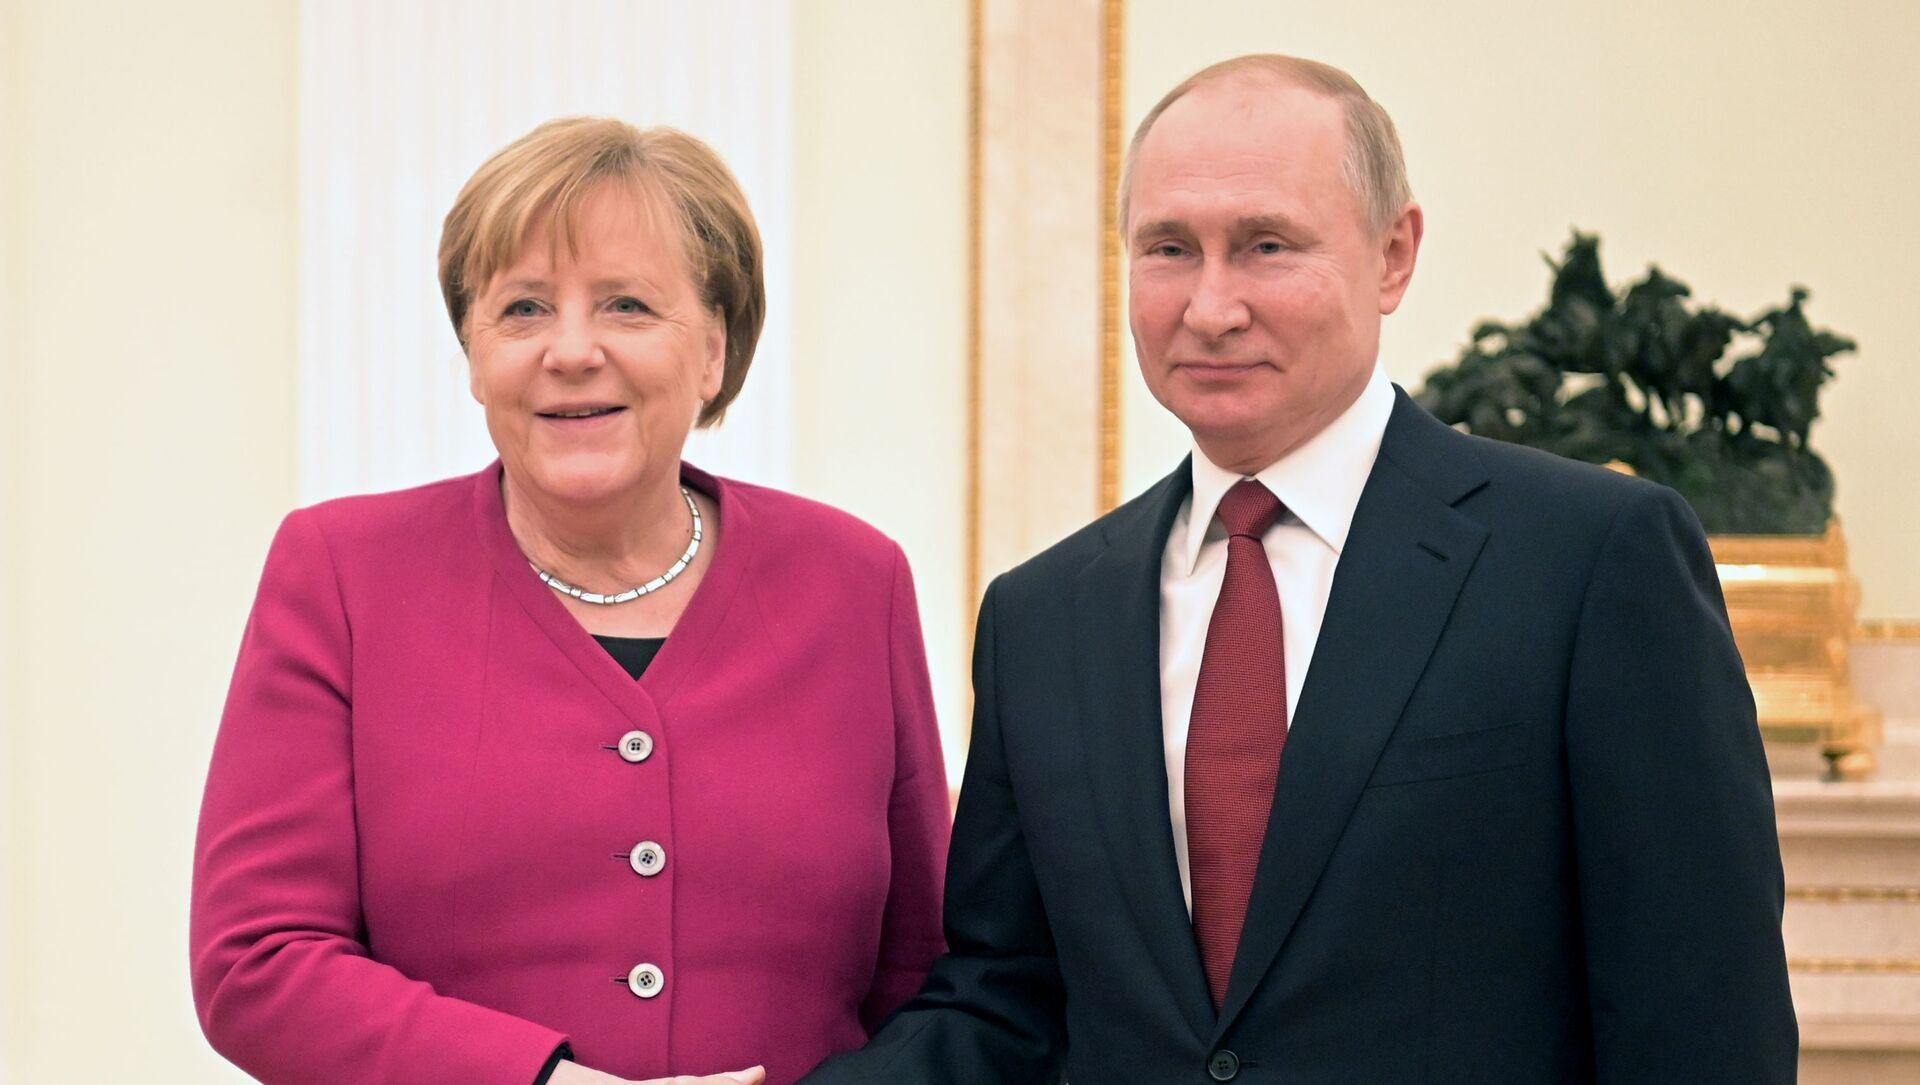 Il presidente russo Vladimir Putin e la cancelliera tedesca Angela Merkel l'11 gennaio 2020 - Sputnik Italia, 1920, 20.04.2021